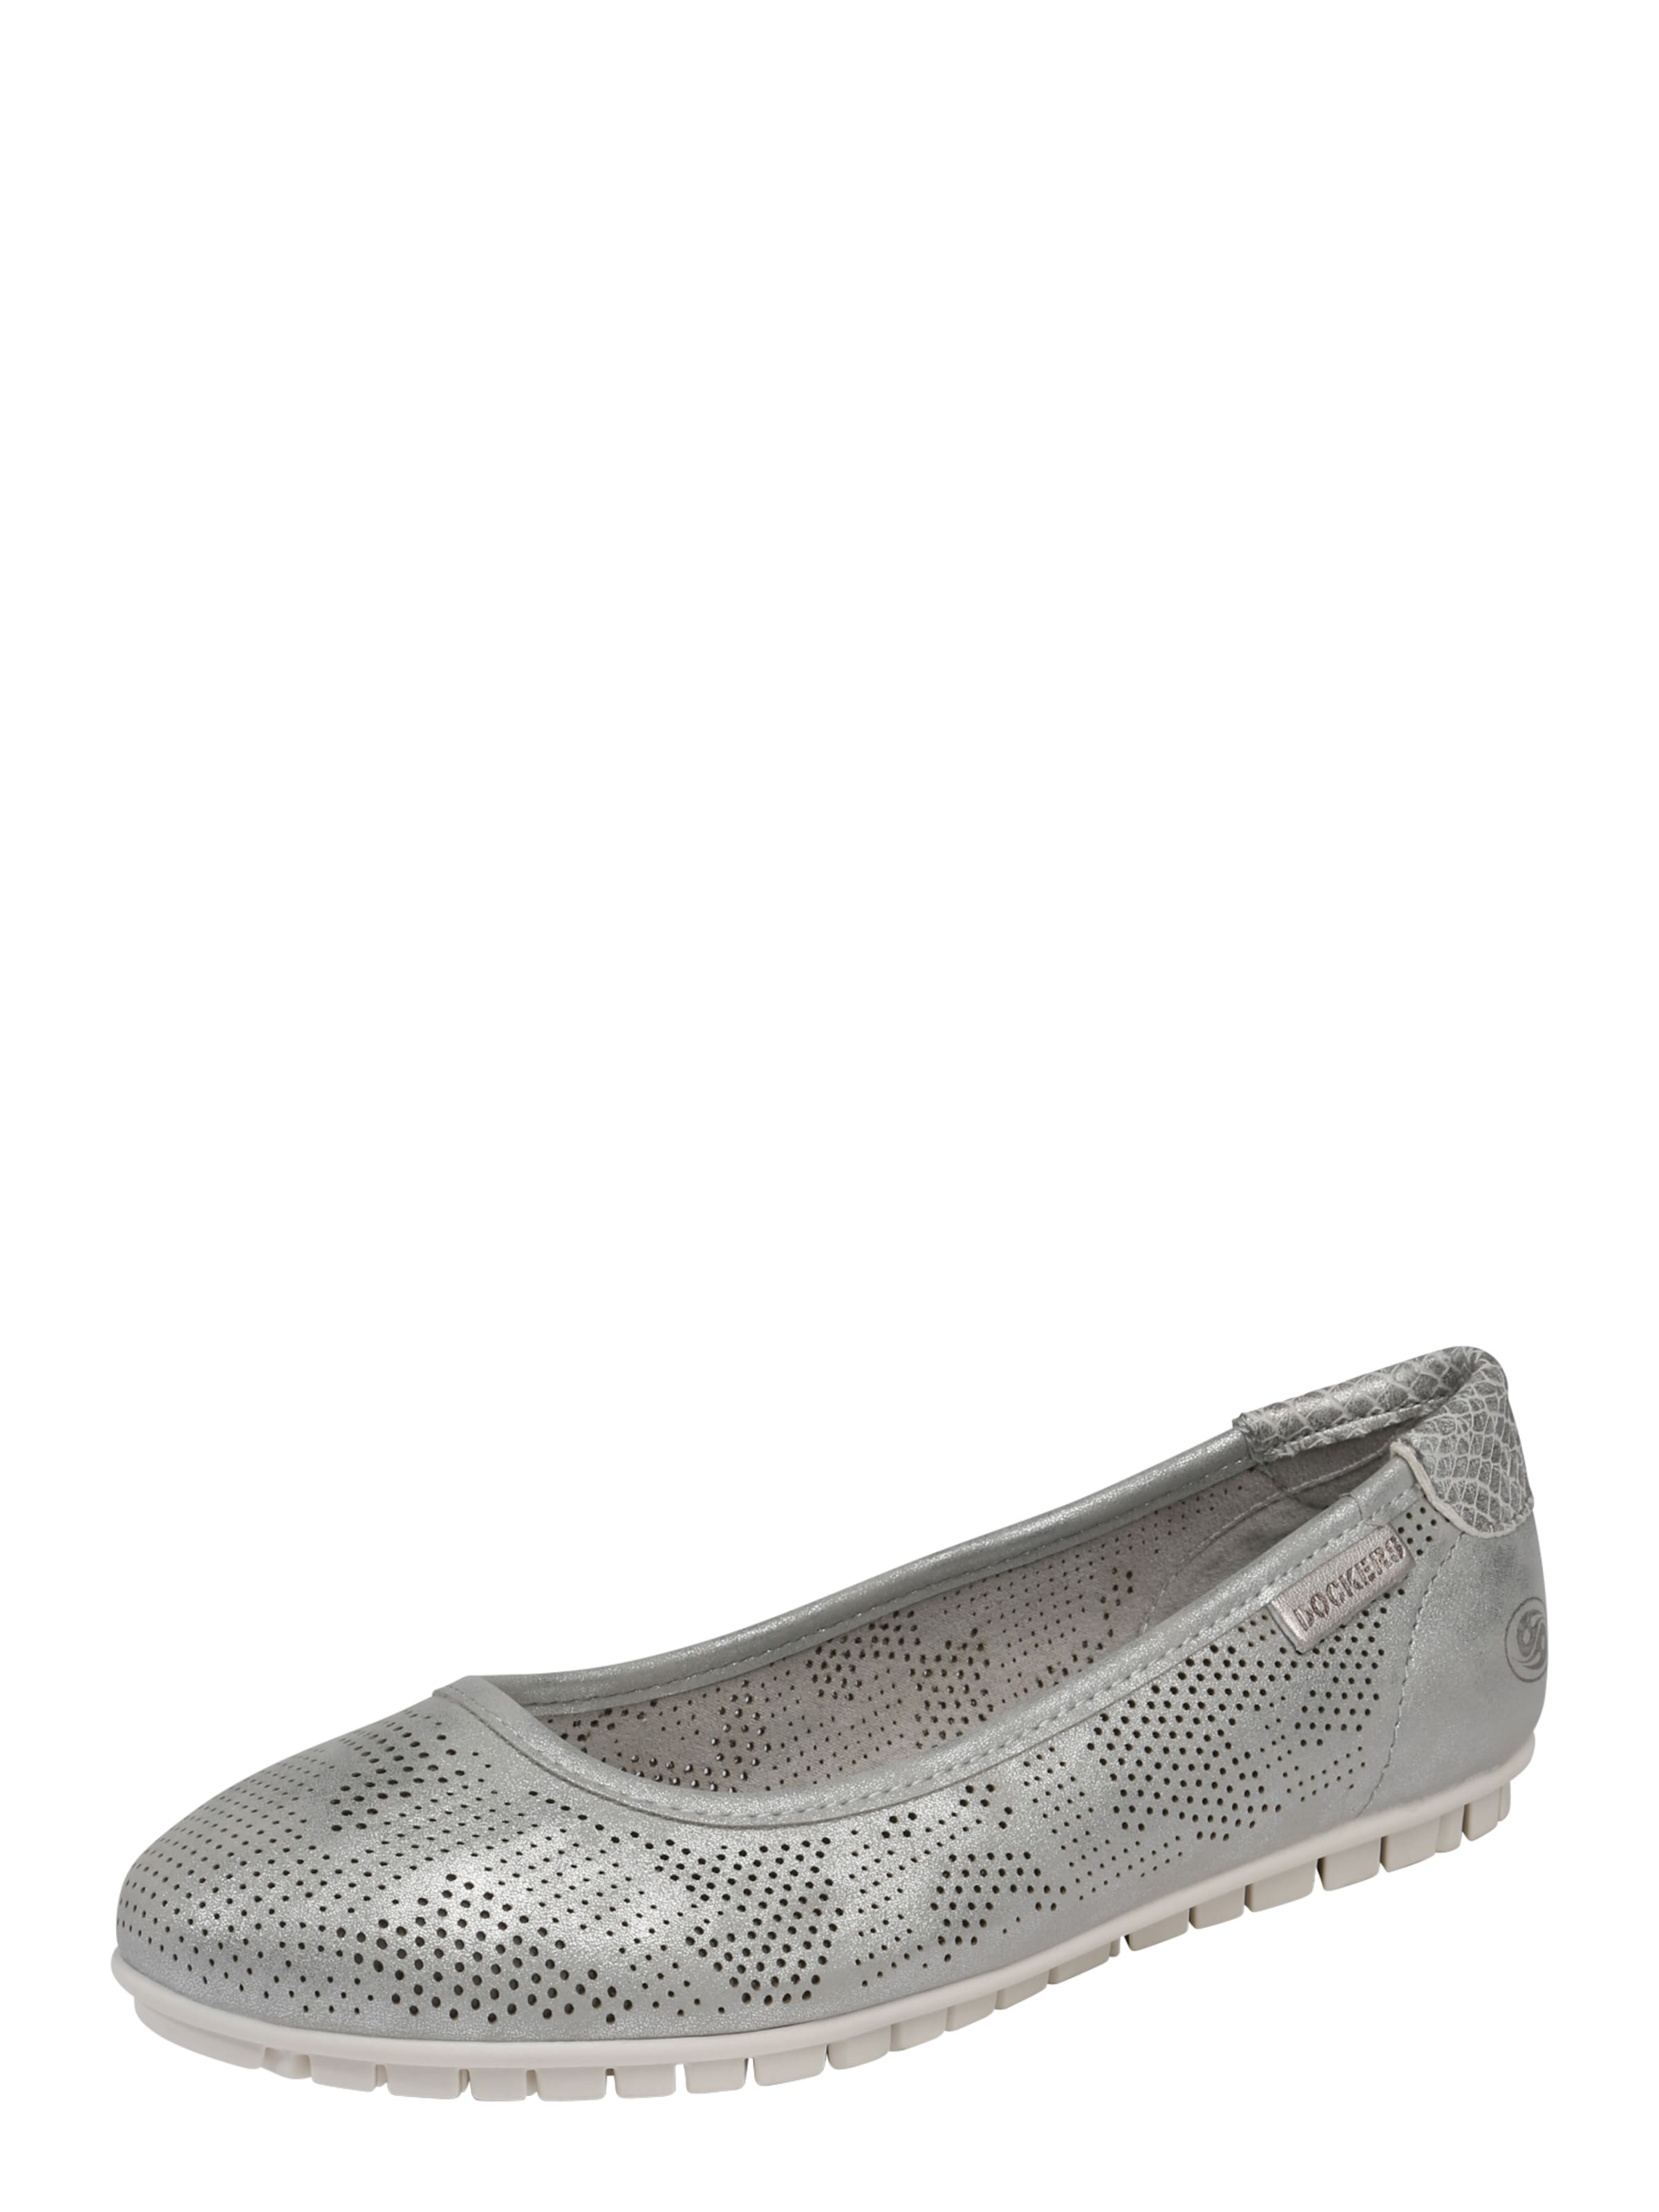 Haltbare Mode billige Schuhe Dockers by Gerli | Ballerinas Schuhe Gut getragene Schuhe